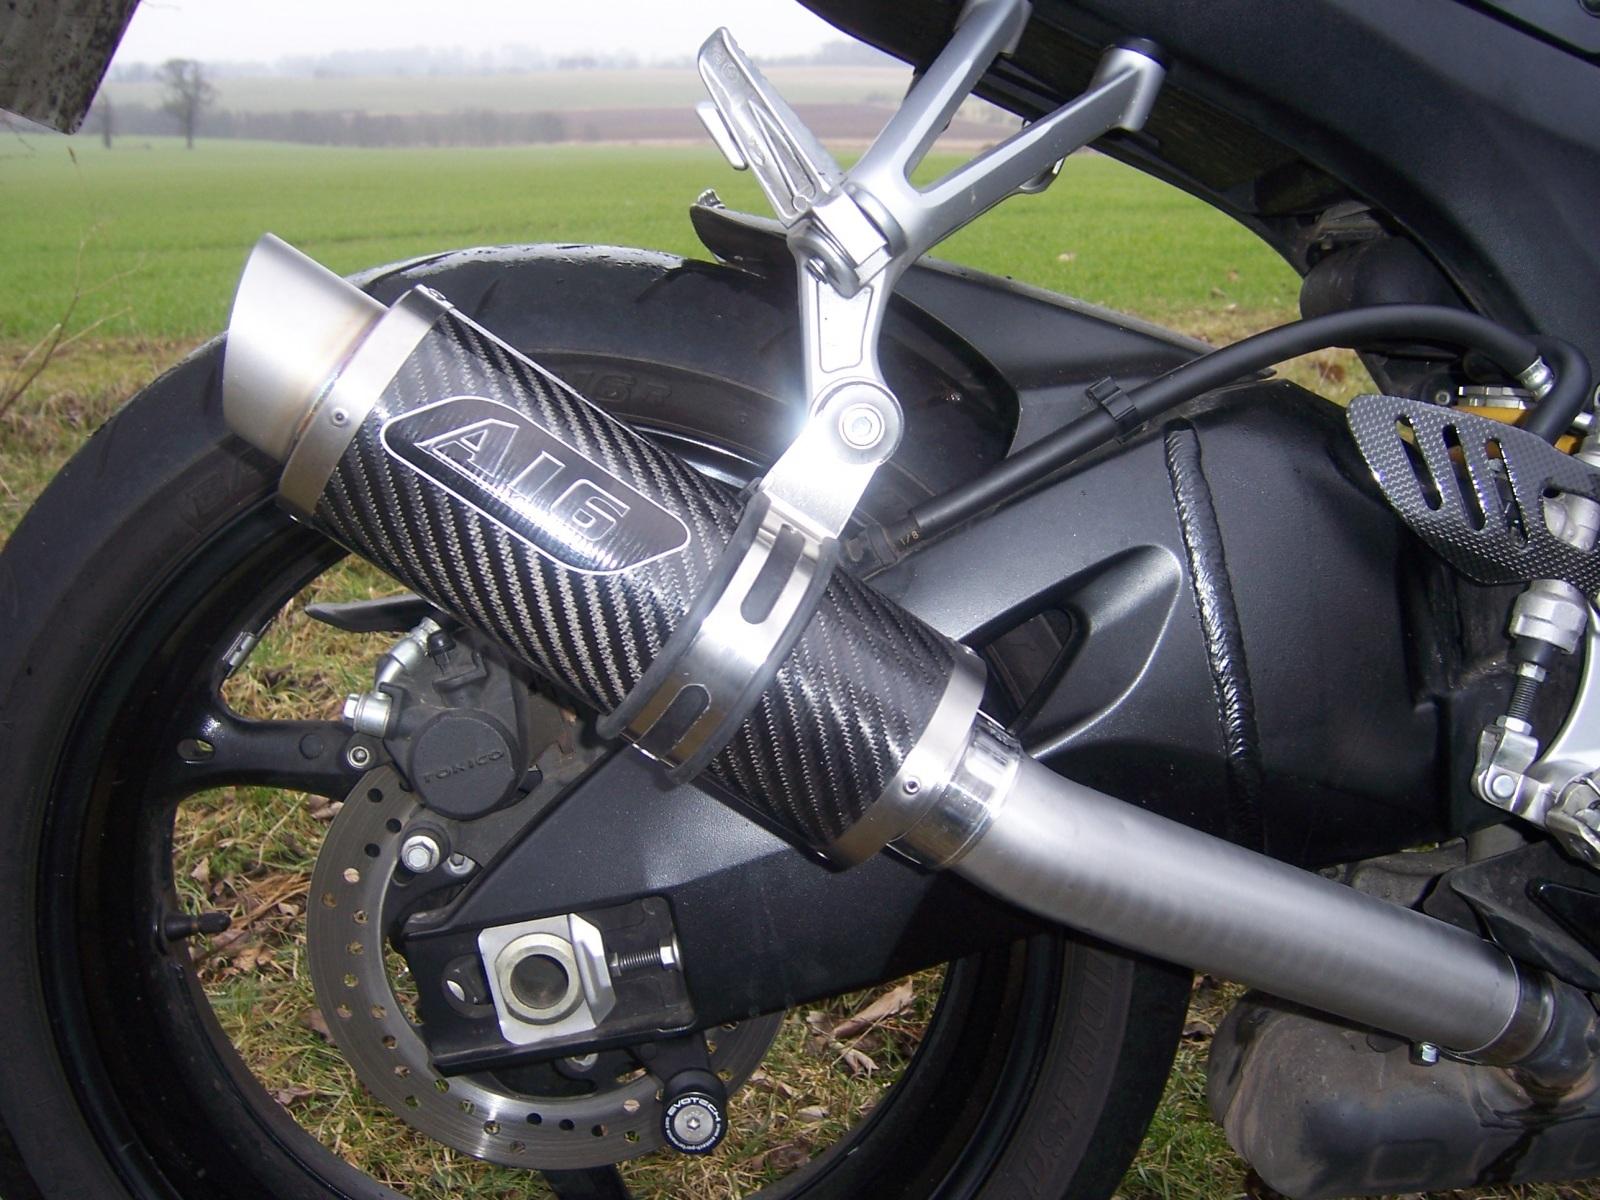 "Suzuki GSXR 1000 K7-K8 2007-2008<p>A16 Moto GP Carbon Exhaust with Titanium Type Slashcut Outlet.  Big Bore Link Pipe.</p><br><a href=""https://a16roadnracesupplies.co.uk/product/a16-suzuki-exhausts/"">Buy now!</a>"